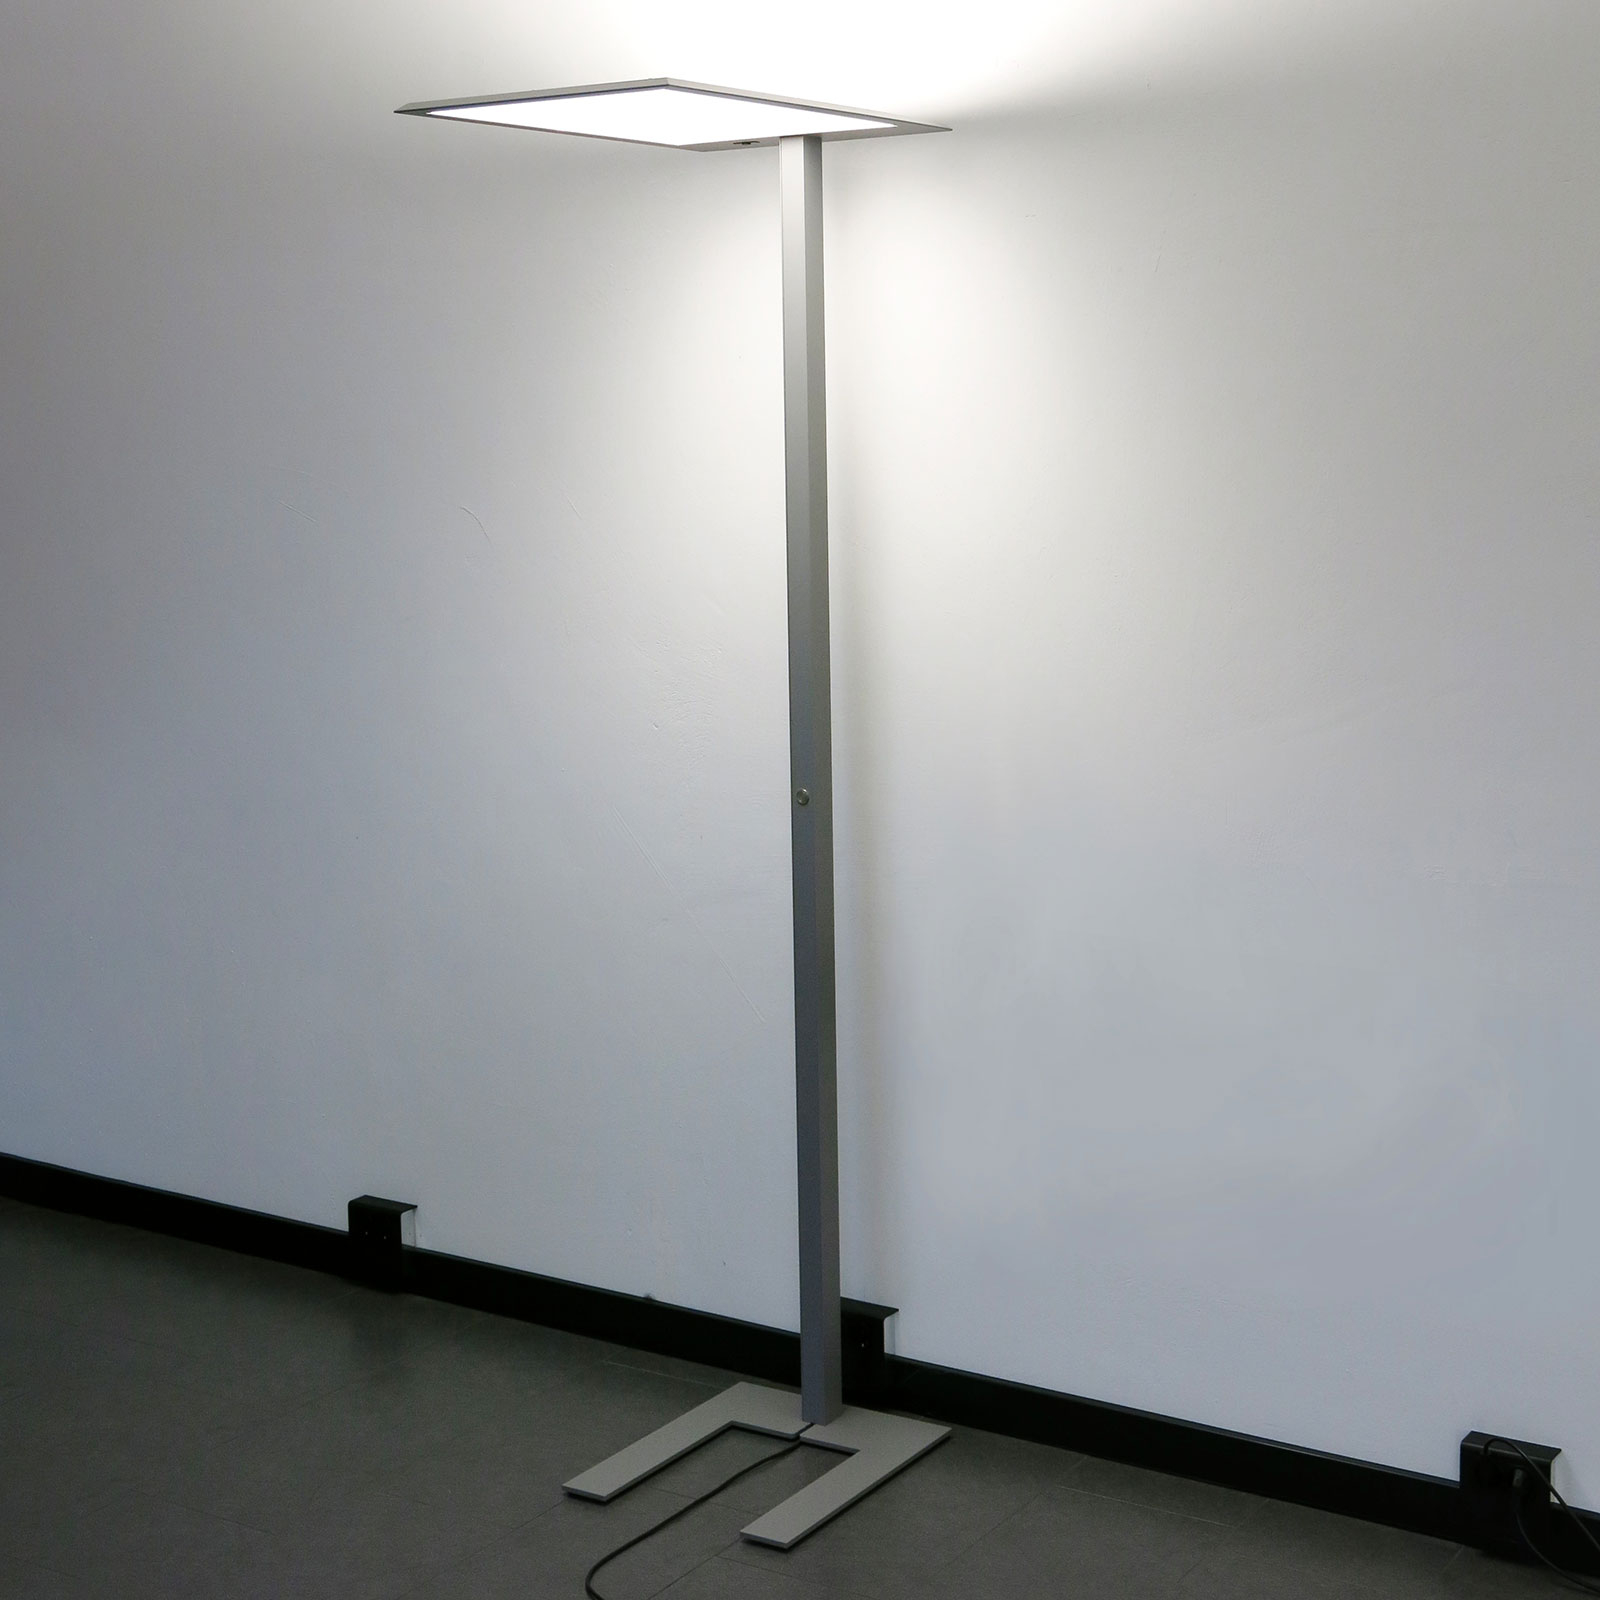 LED-Stehleuchte LEAS, 203 cm, titan, Taster